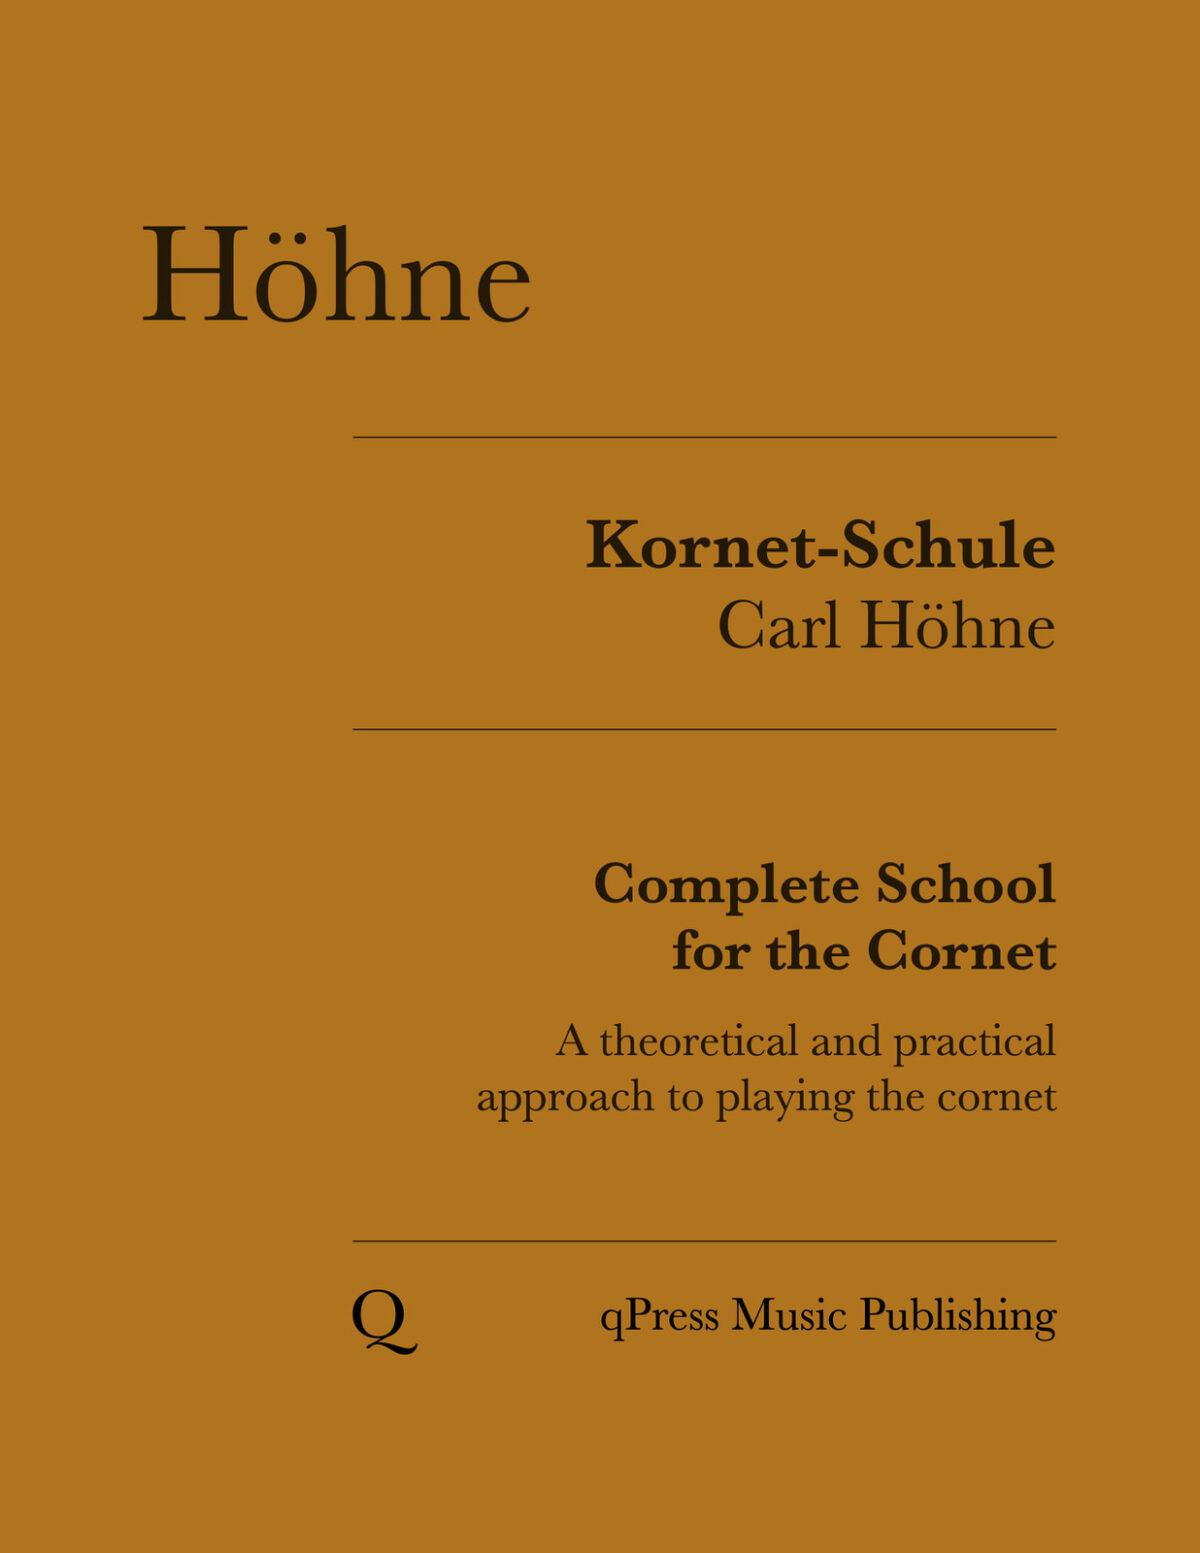 Hohne, Cornet School